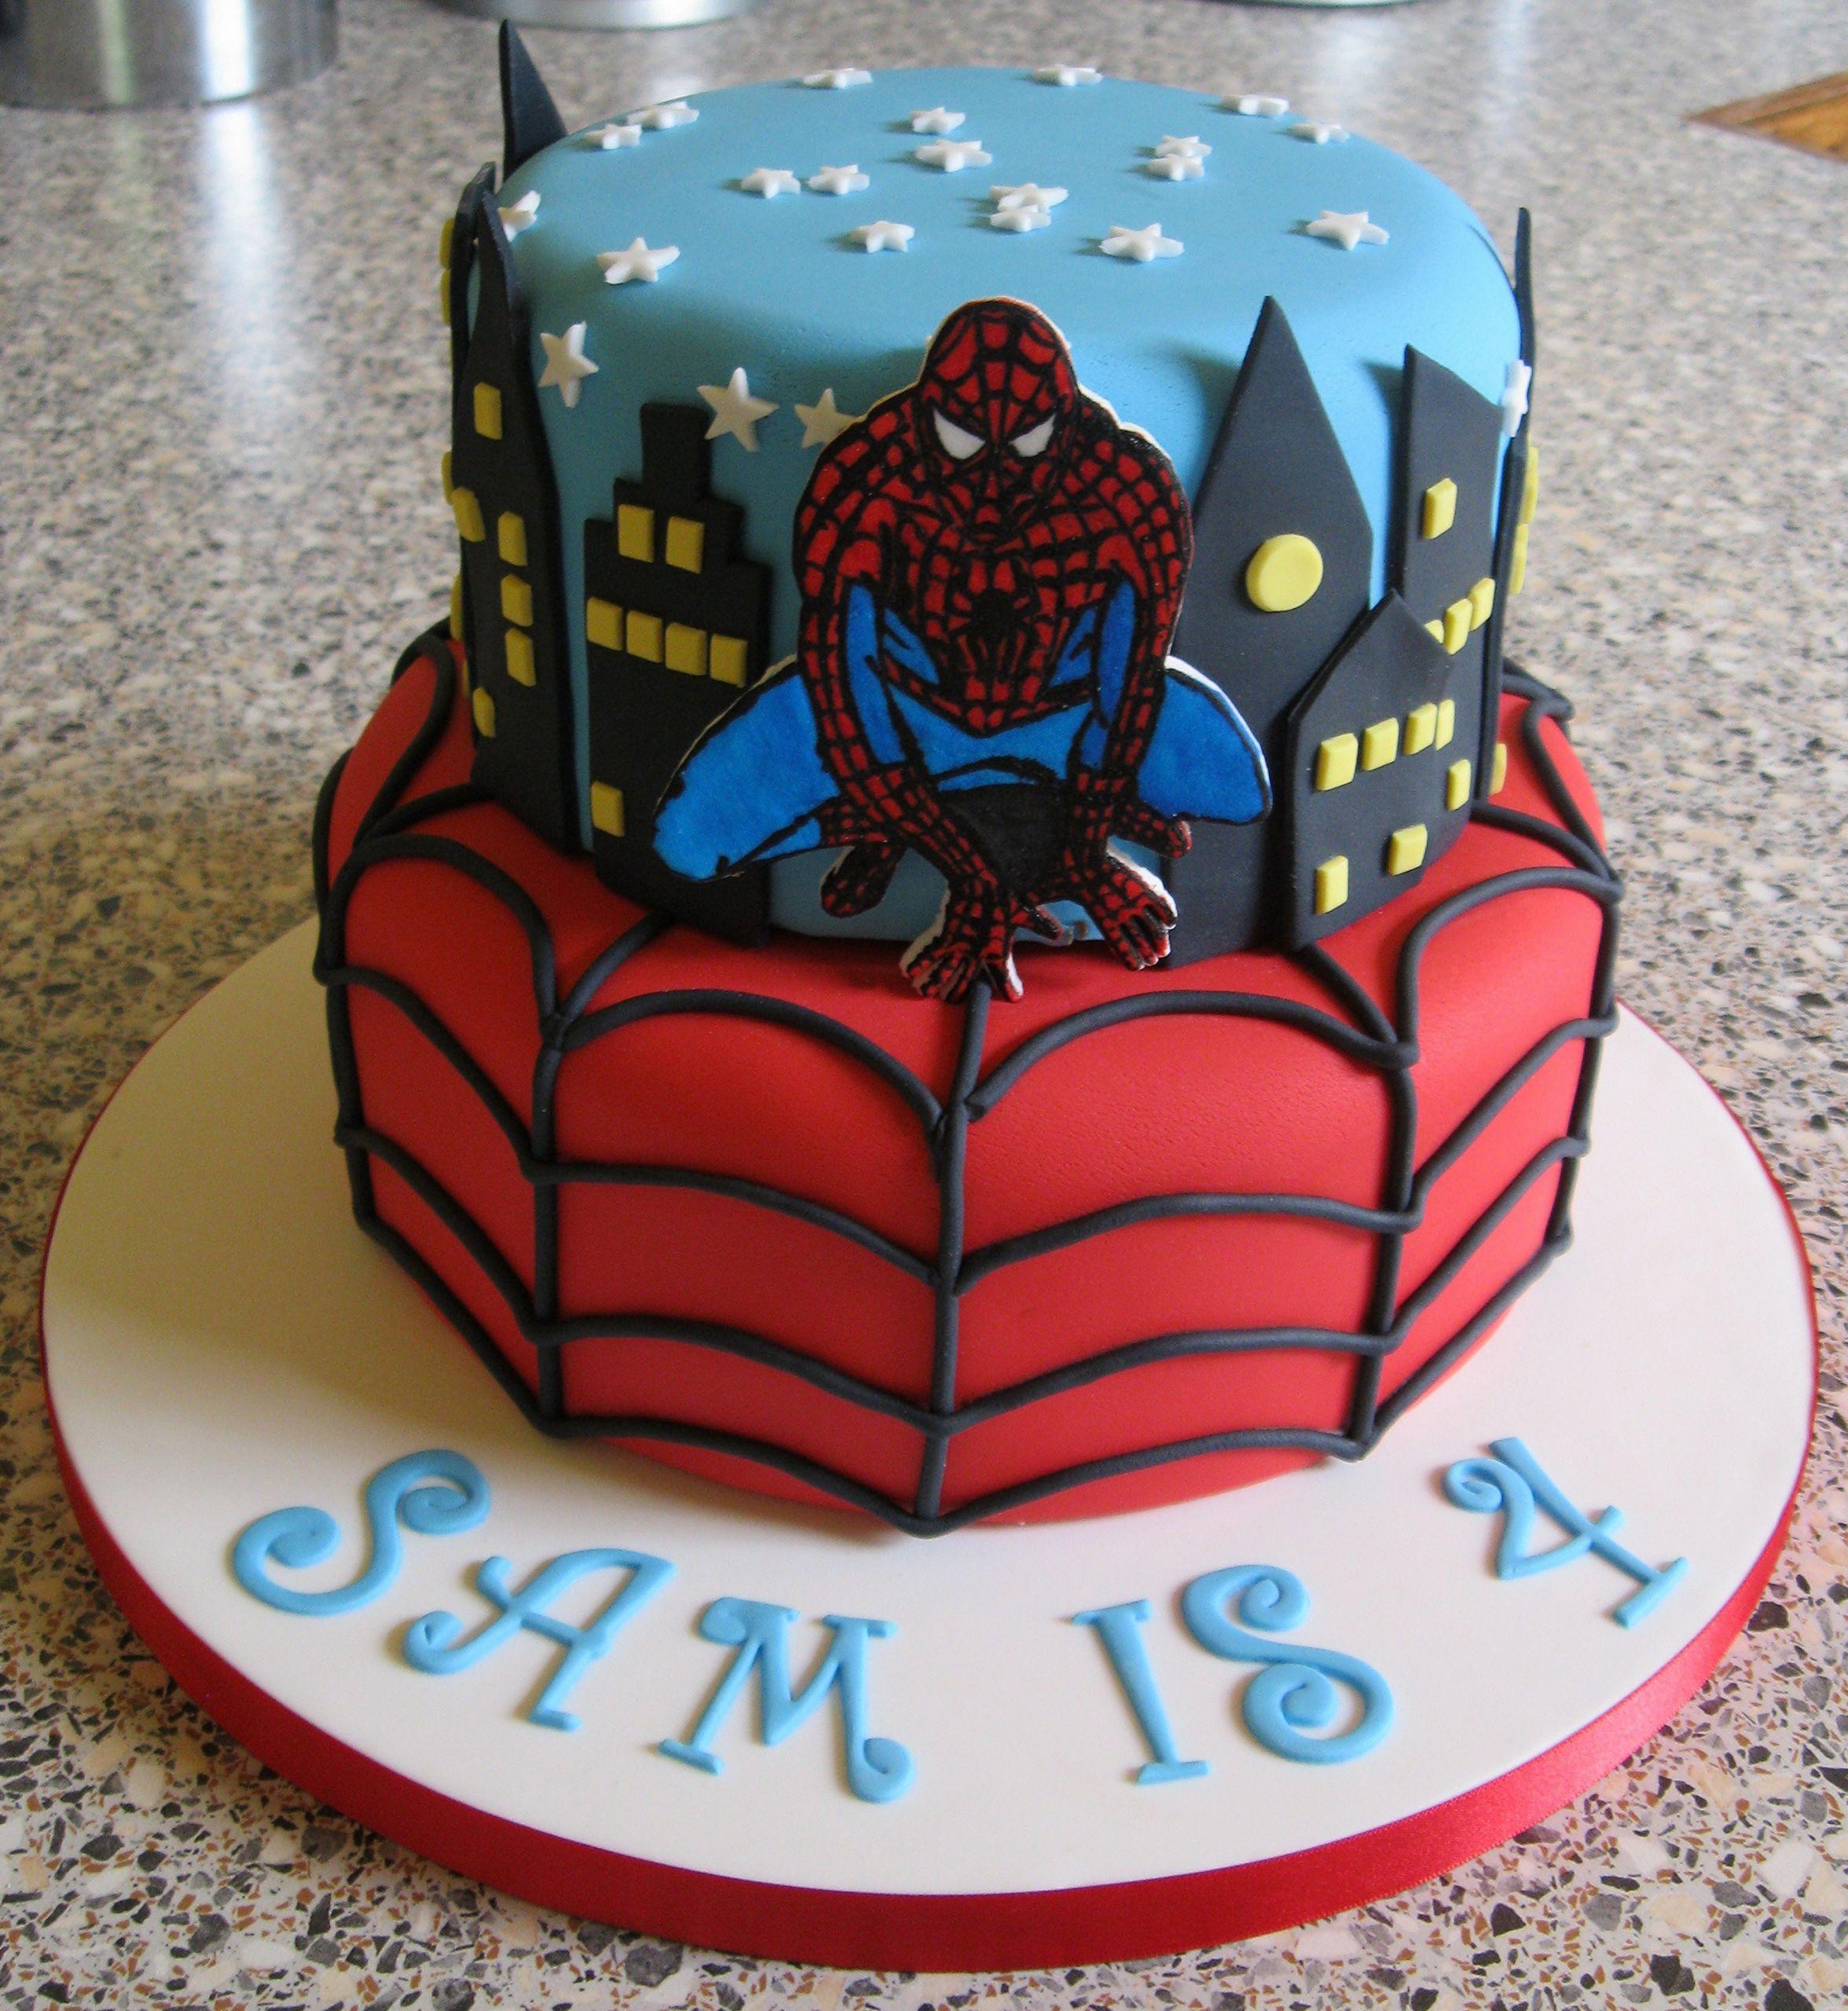 Spiderman Birthday Cakes  Spiderman Cakes – Decoration Ideas